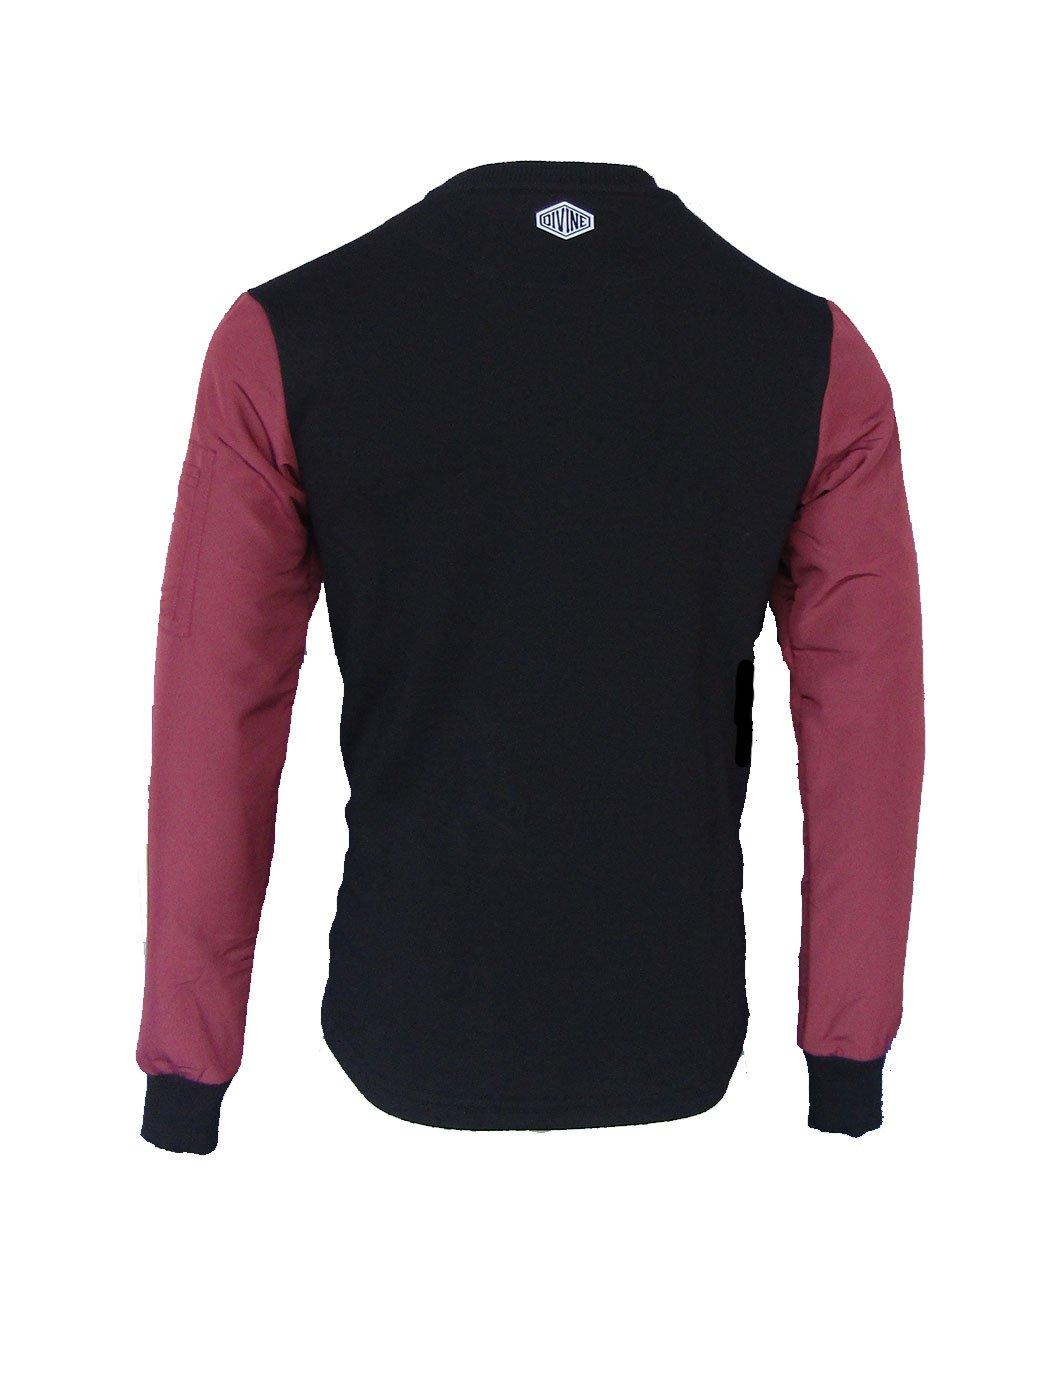 Camberwell Sweat Black/Red